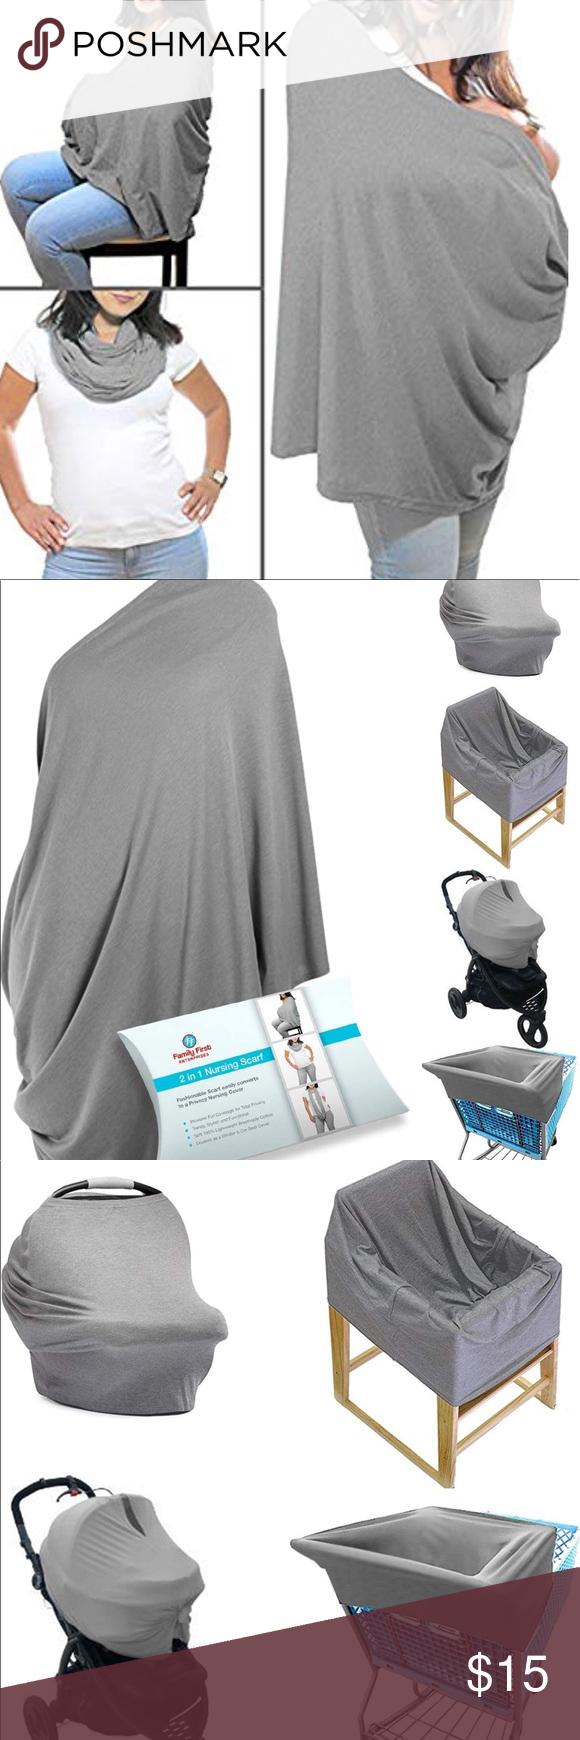 2 in 1 Nursing Scarf. Breastfeeding Cover Infinity Scarf